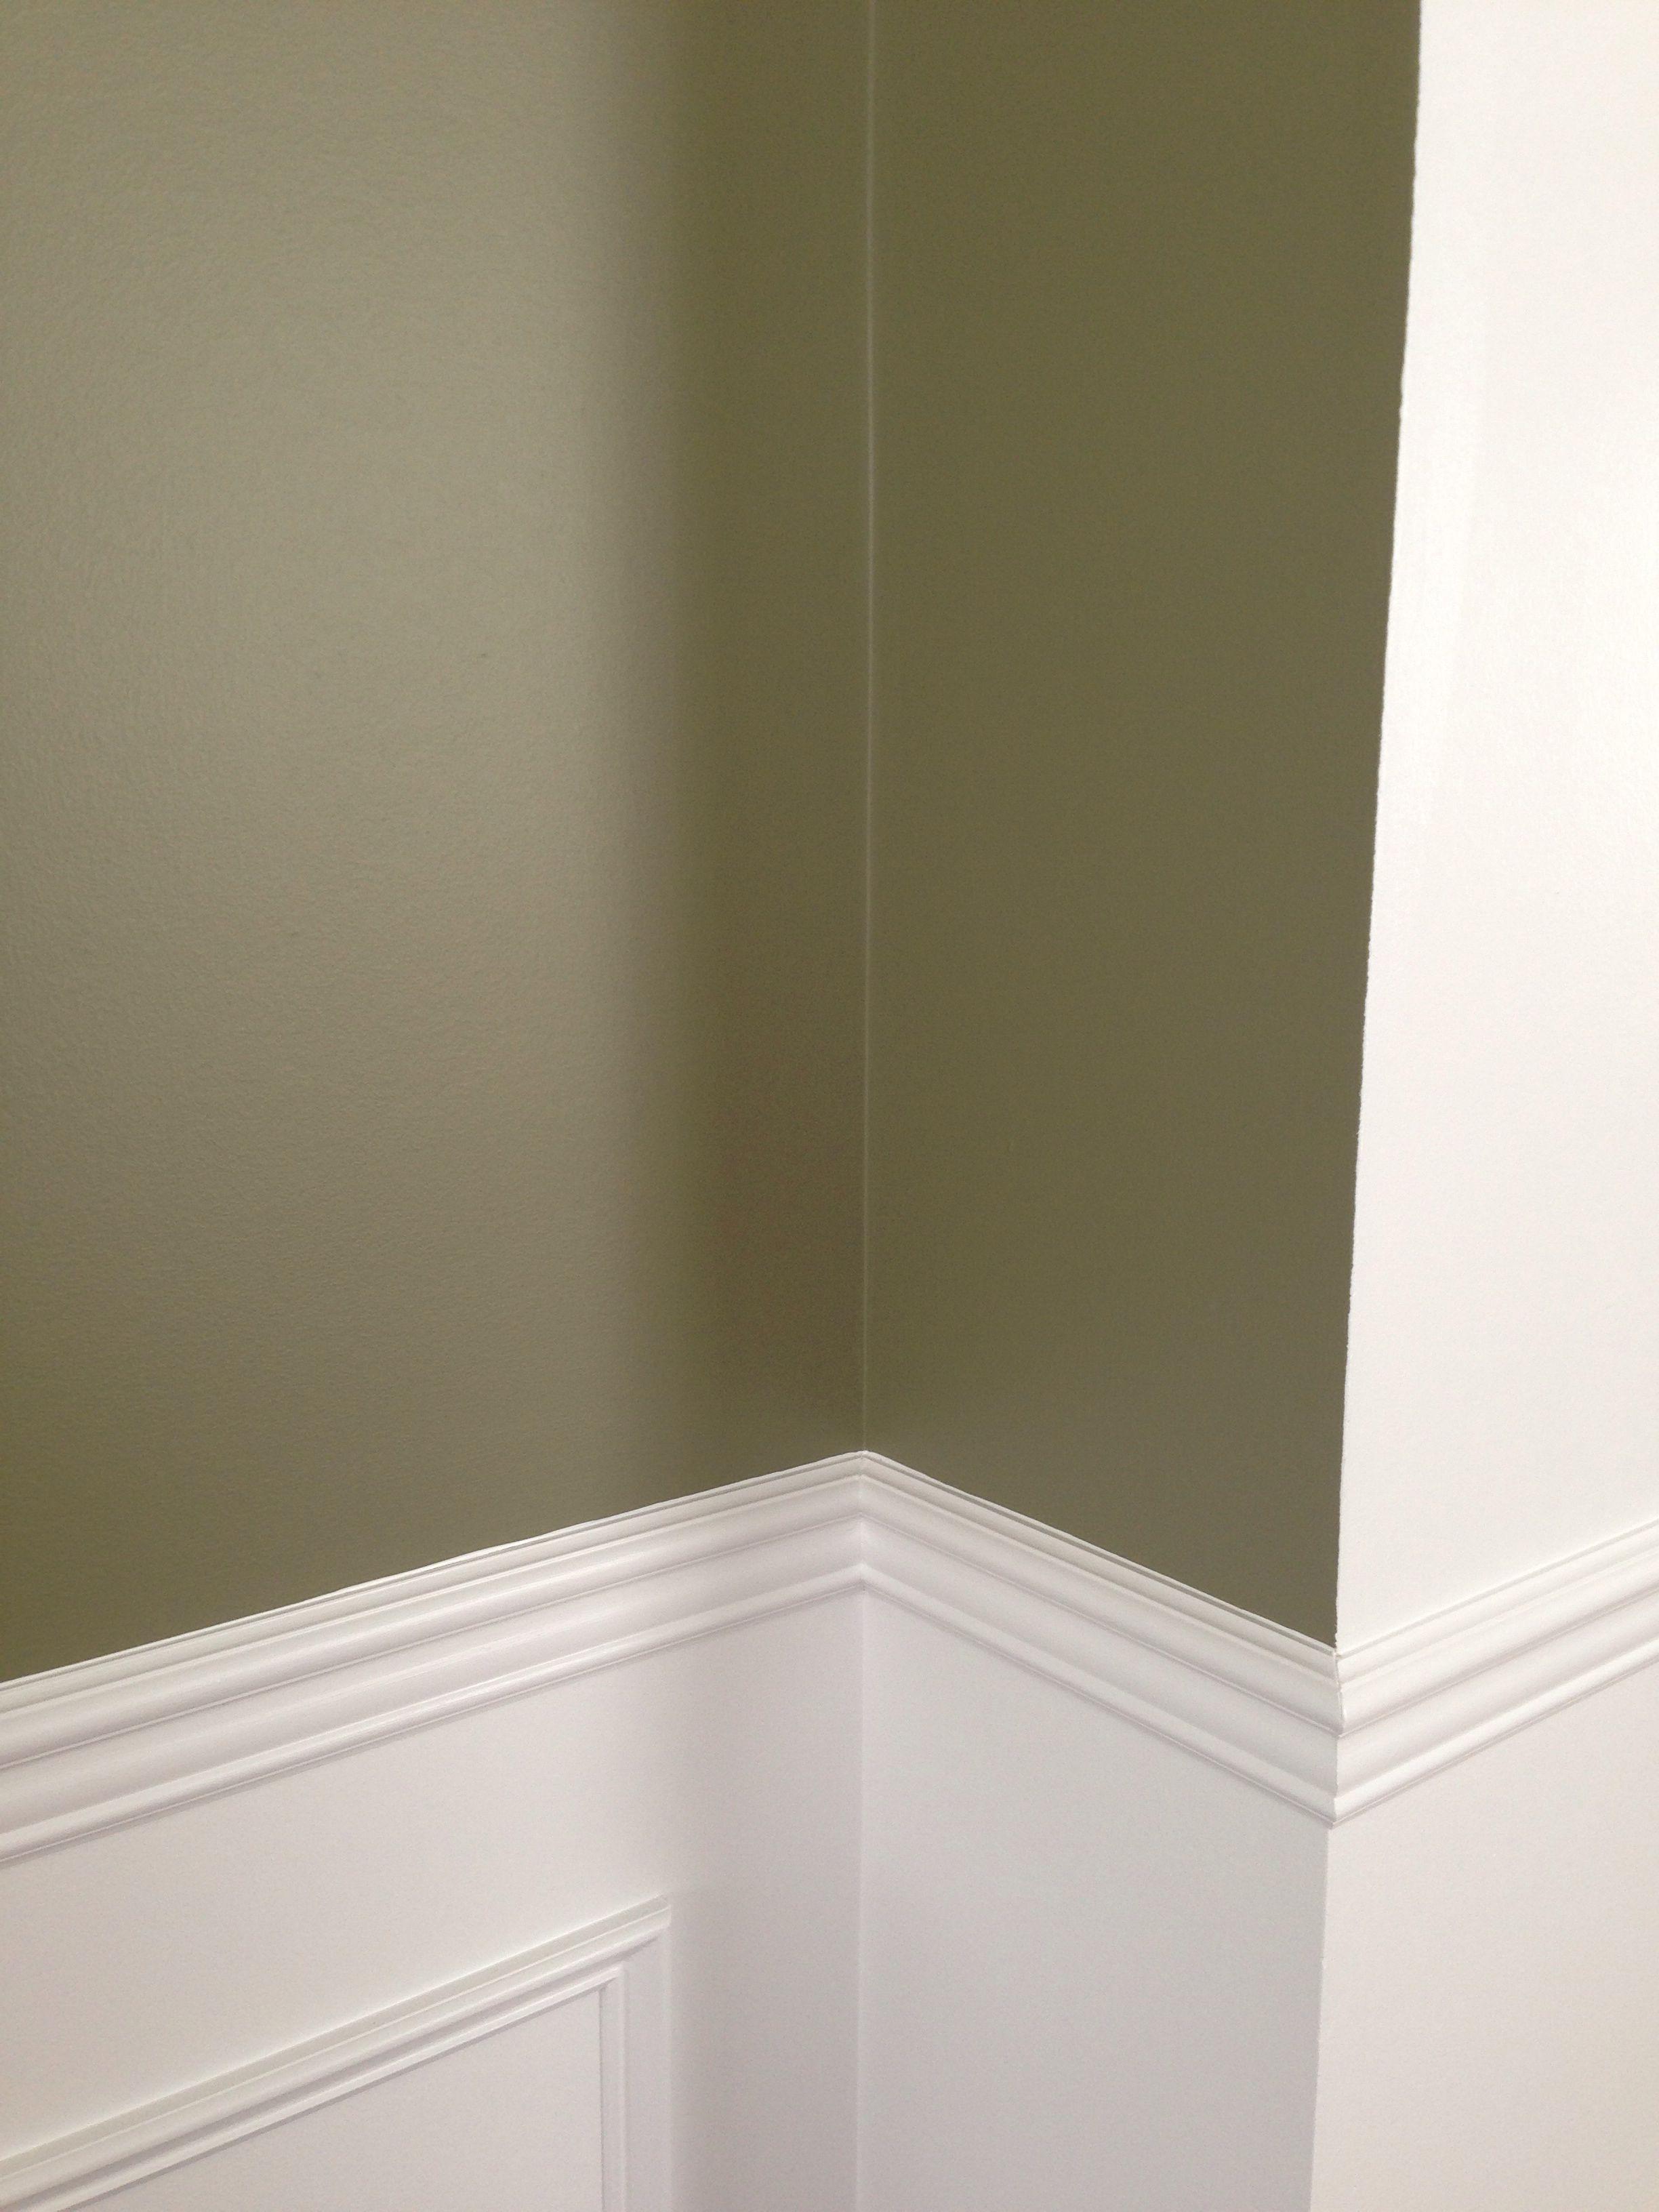 Benjamin Moore Wethersfield Moss Paint A Grayish Green